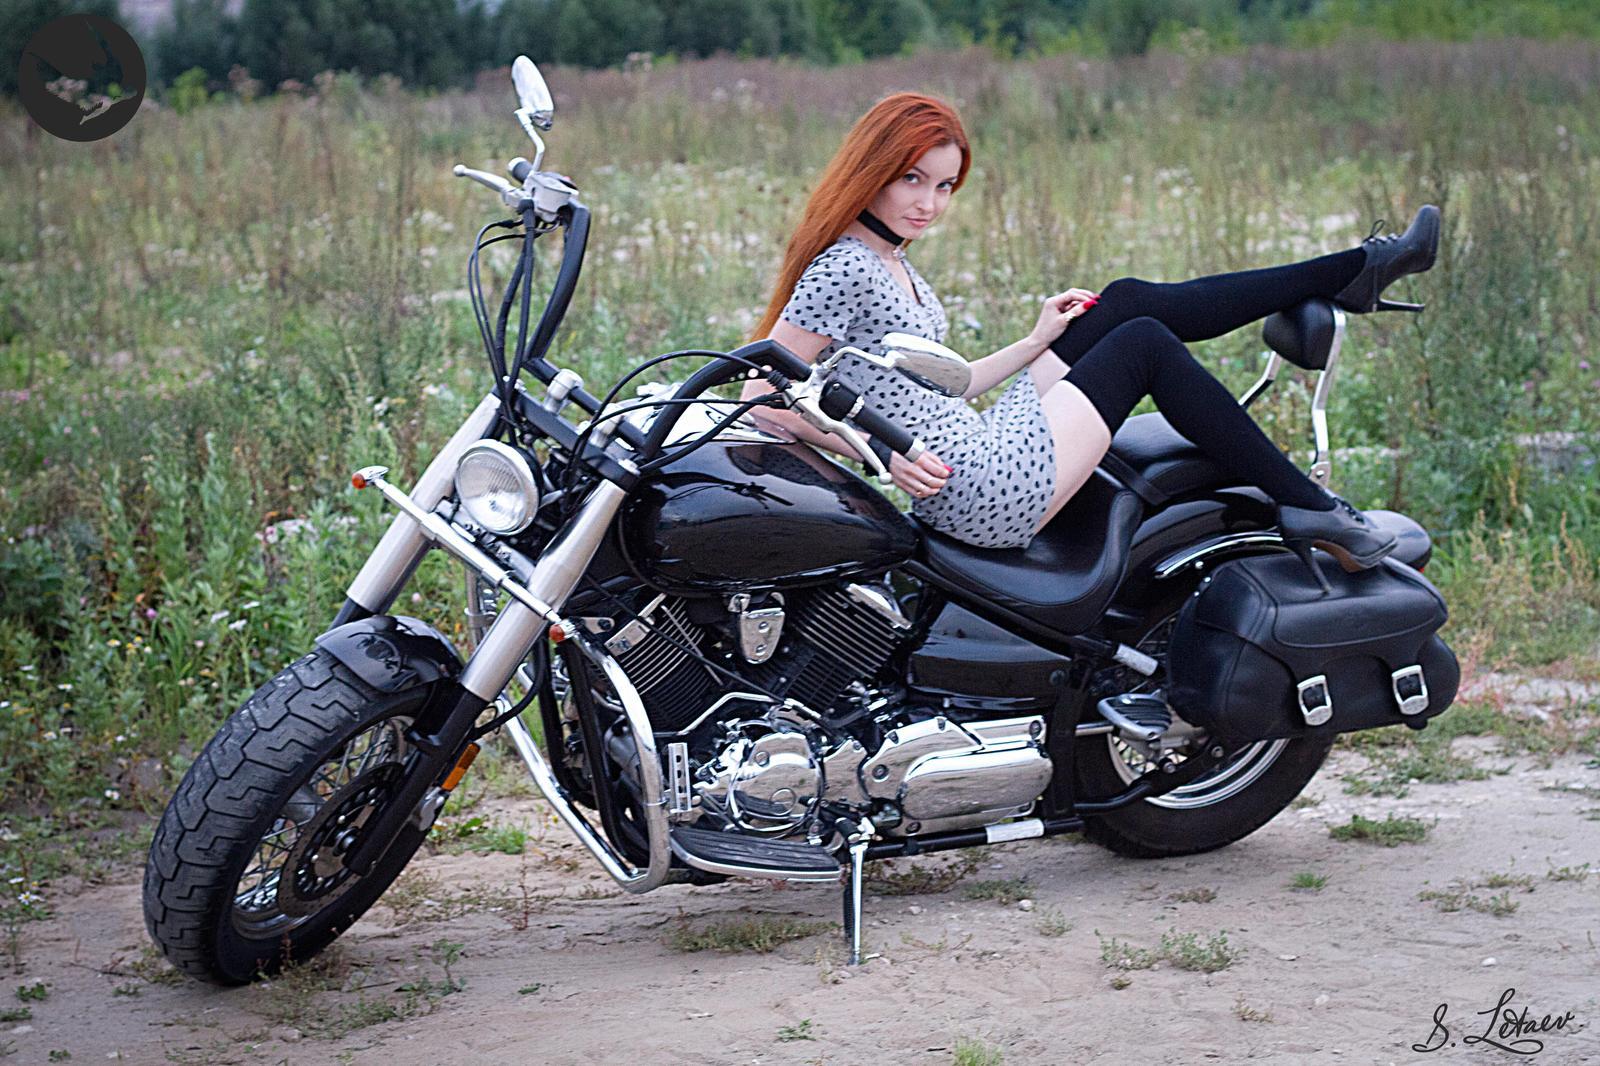 работа для девушек мотоциклы